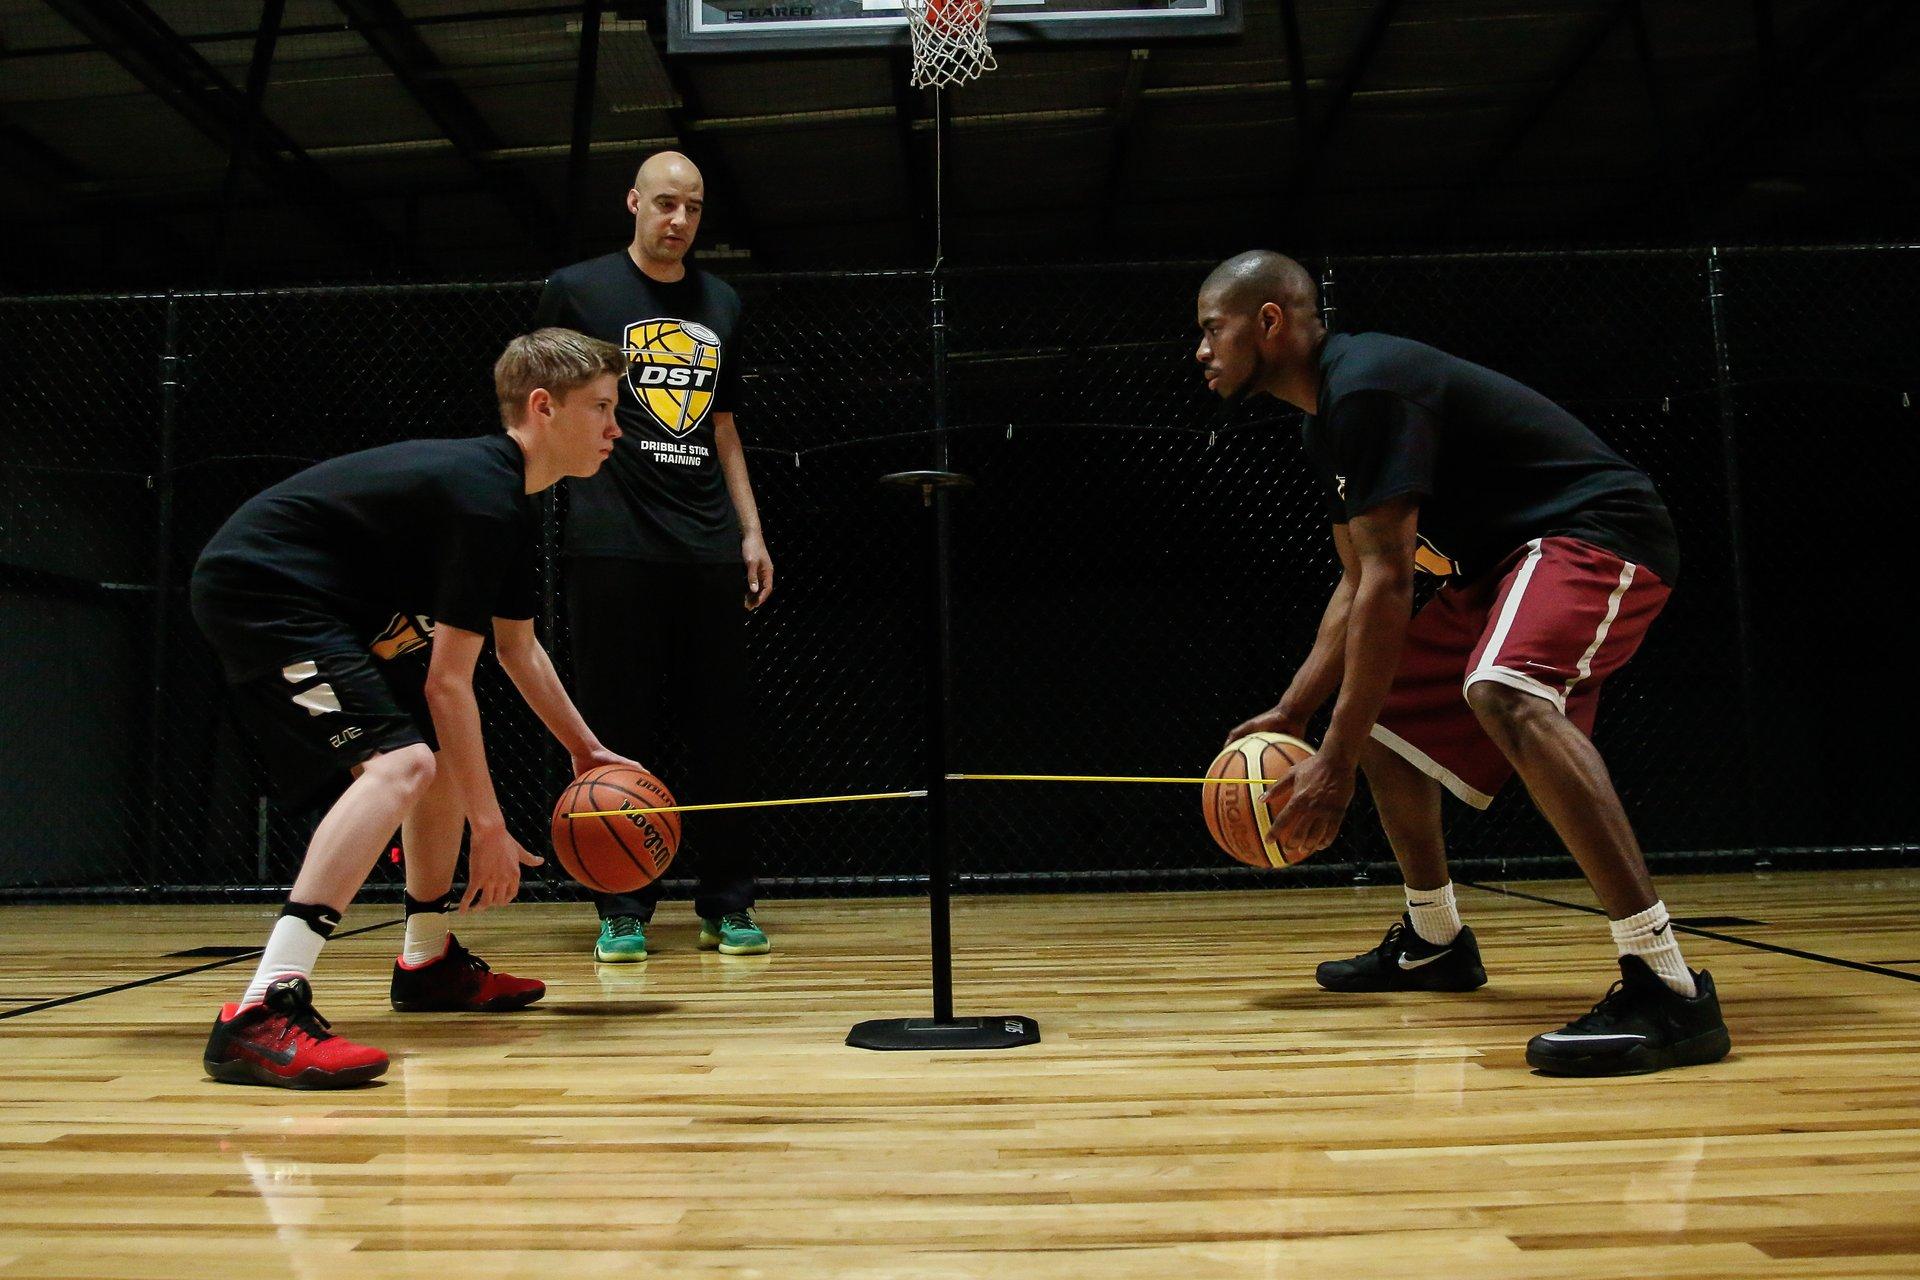 Hasil gambar untuk basketball training fun